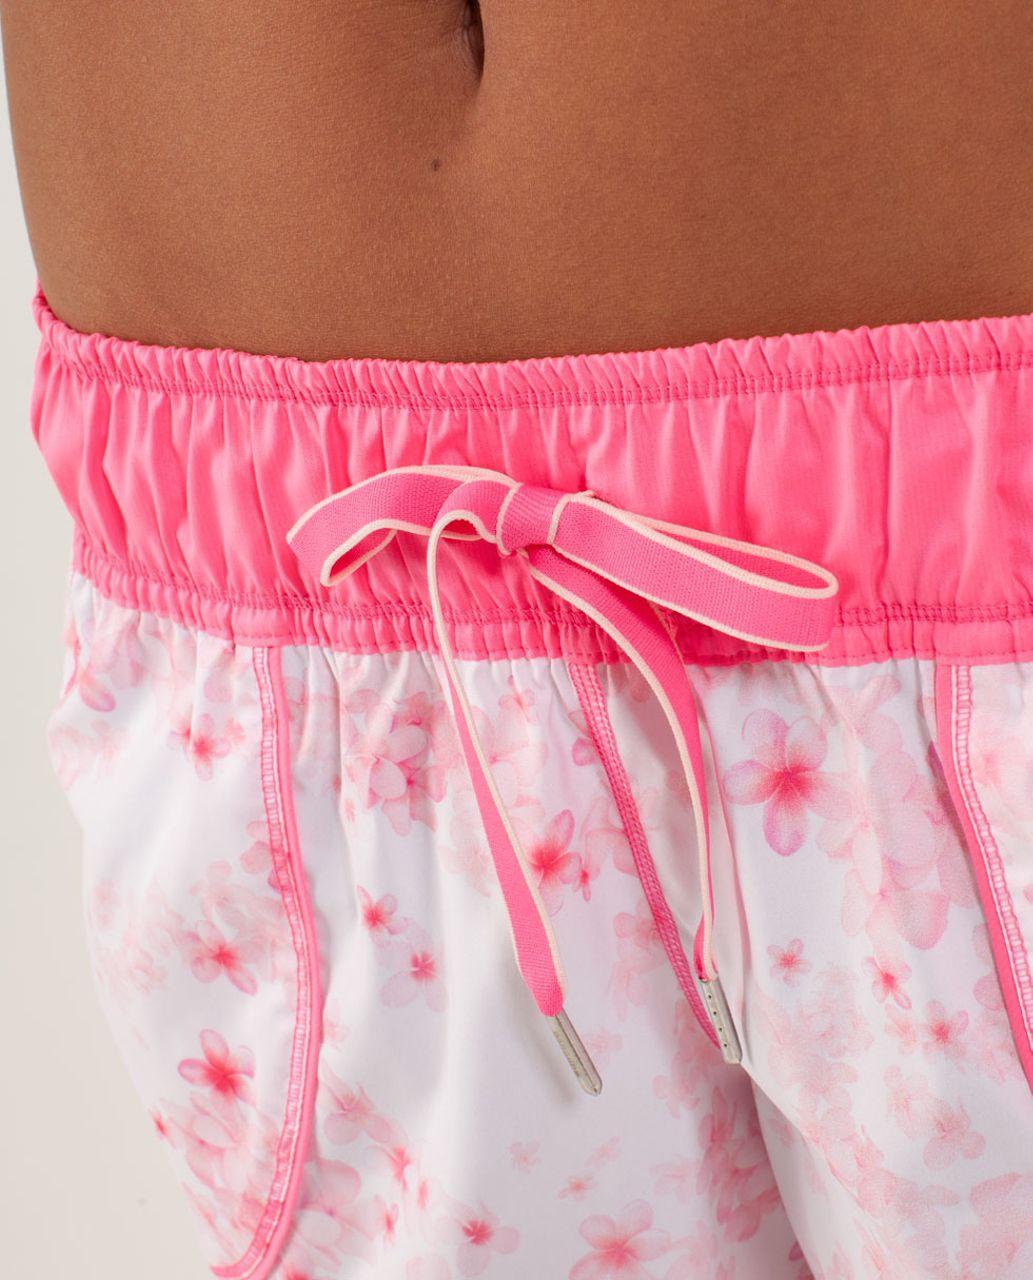 Lululemon Work It Out Short - Frangipani Parfait Pink / Pinkelicious